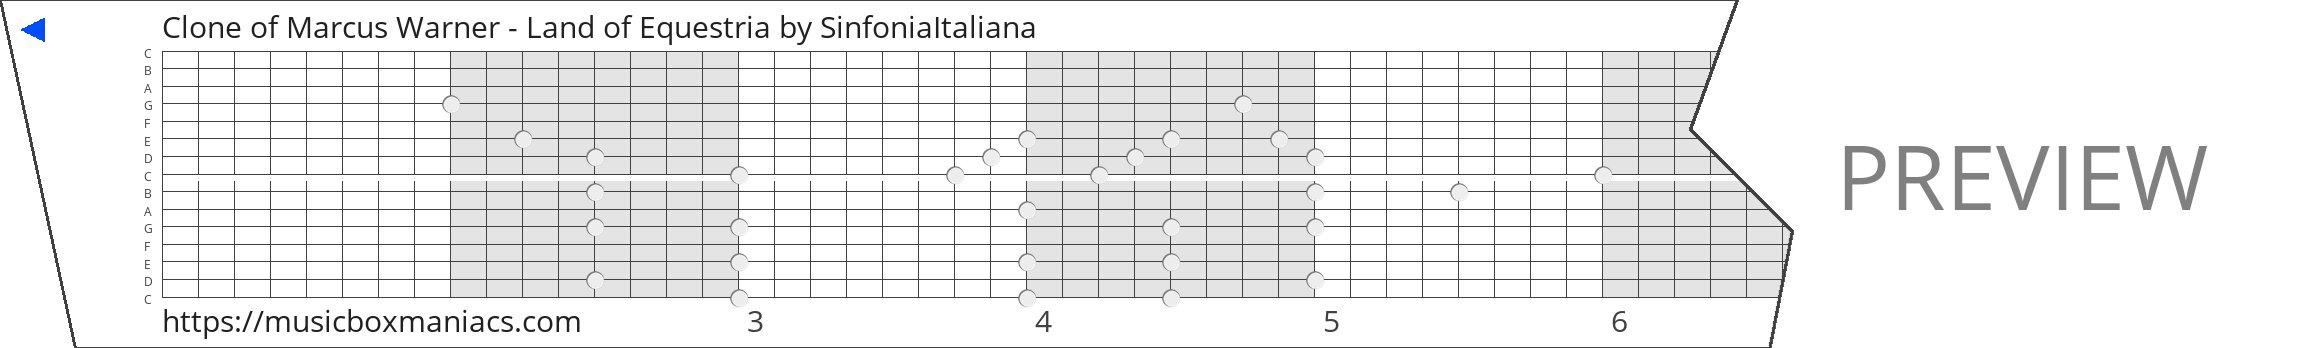 Clone of Marcus Warner - Land of Equestria 15 note music box paper strip